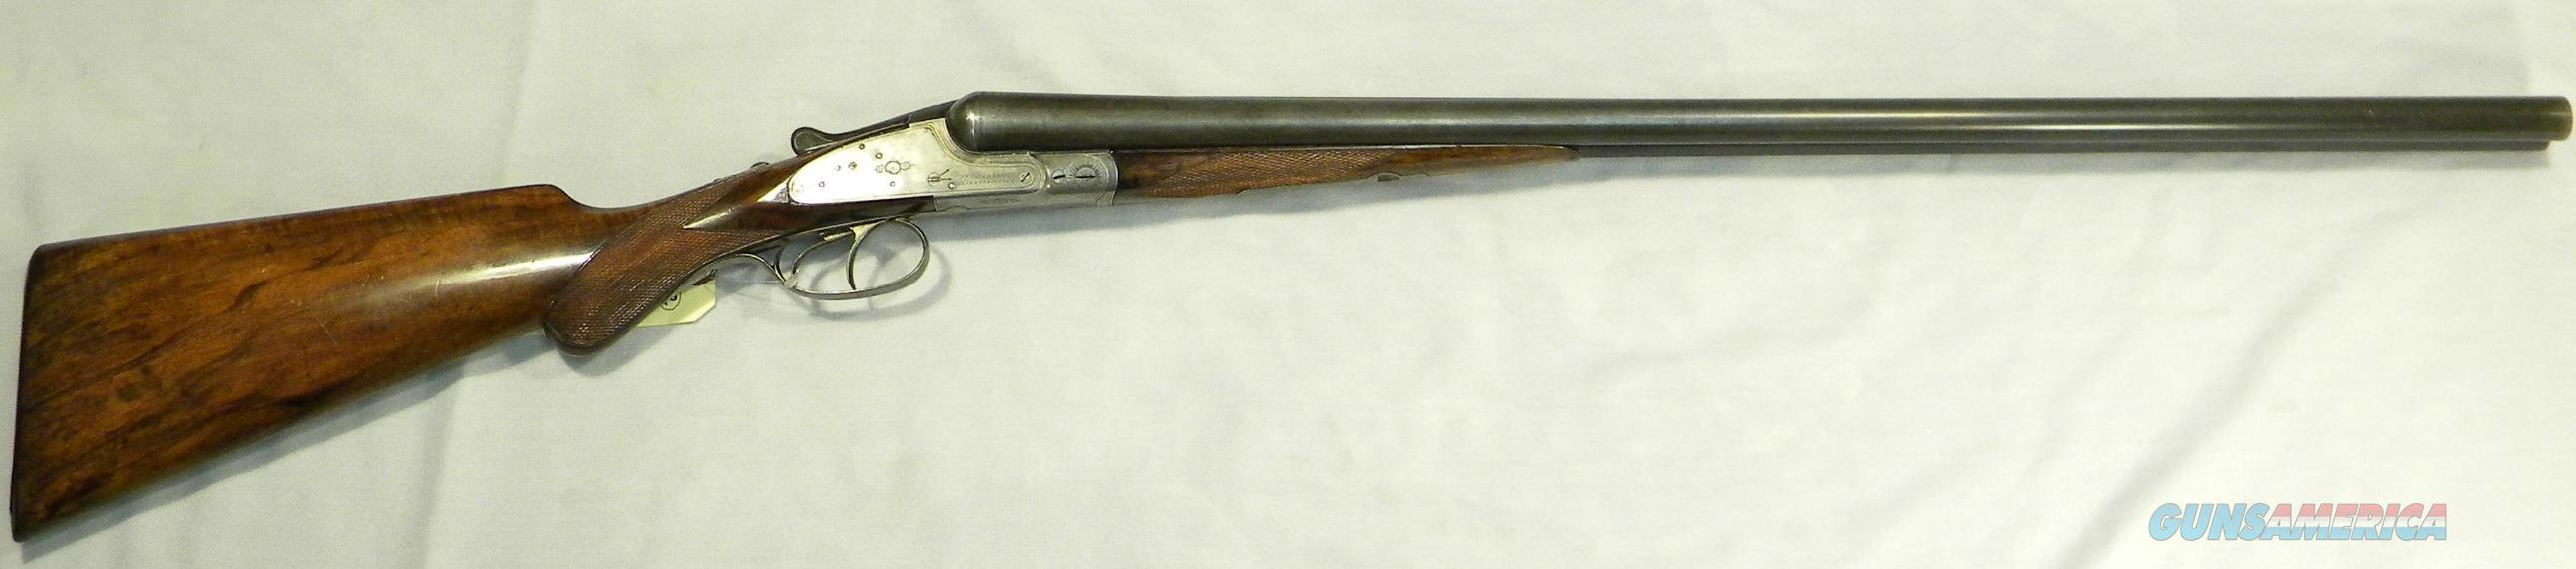 "J.P. Sauer & Son ""Knock-About"", 12 Gauge Side-By-Side Shotgun, Made In Germany  Guns > Shotguns > J.P. Sauer Shotguns"